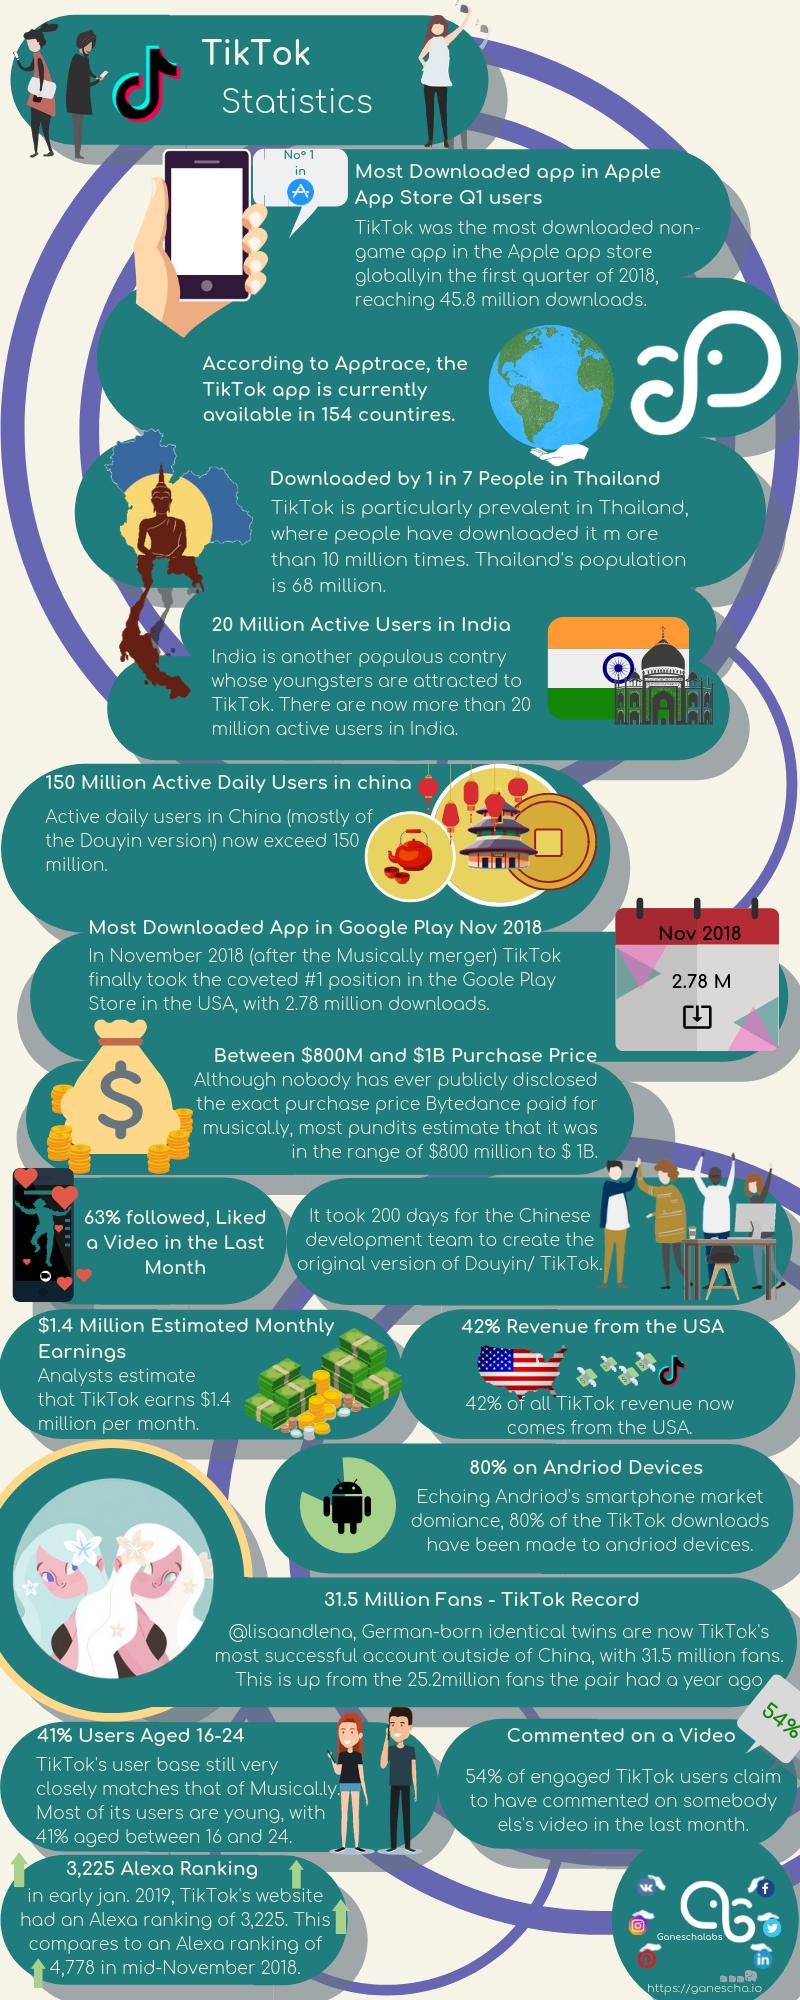 Statistics All About The Hype App Tiktok Socialmediamarketing Ganeschalabs Socialmediamanagement Social Media Software Social Media Content Social Media